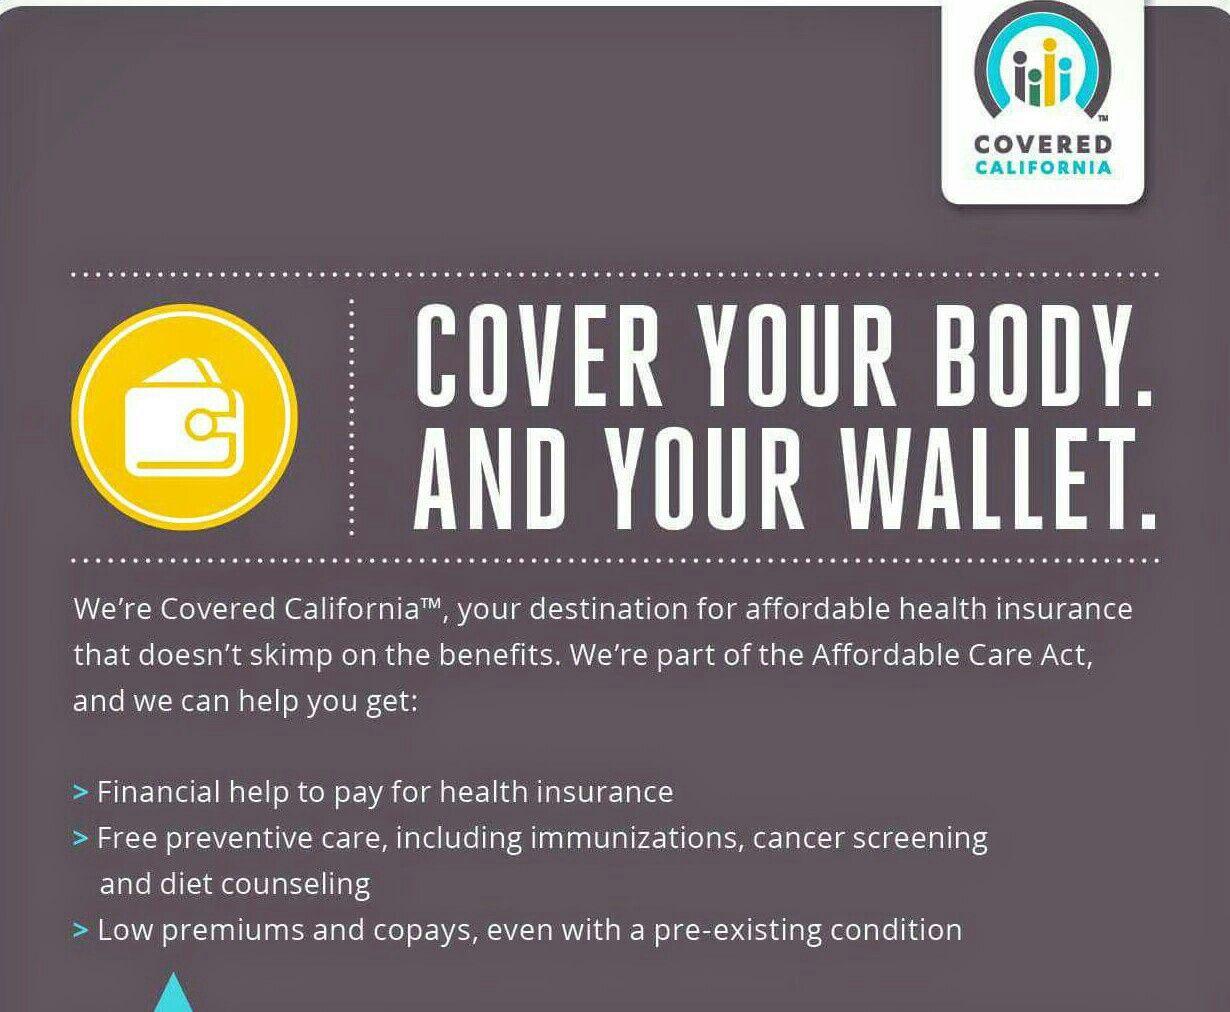 We Ve Got You Covered California Davidgrandberryiv Hotmail Com 562 483 3379 Open En Affordable Health Insurance Preventive Care Marketplace Health Insurance